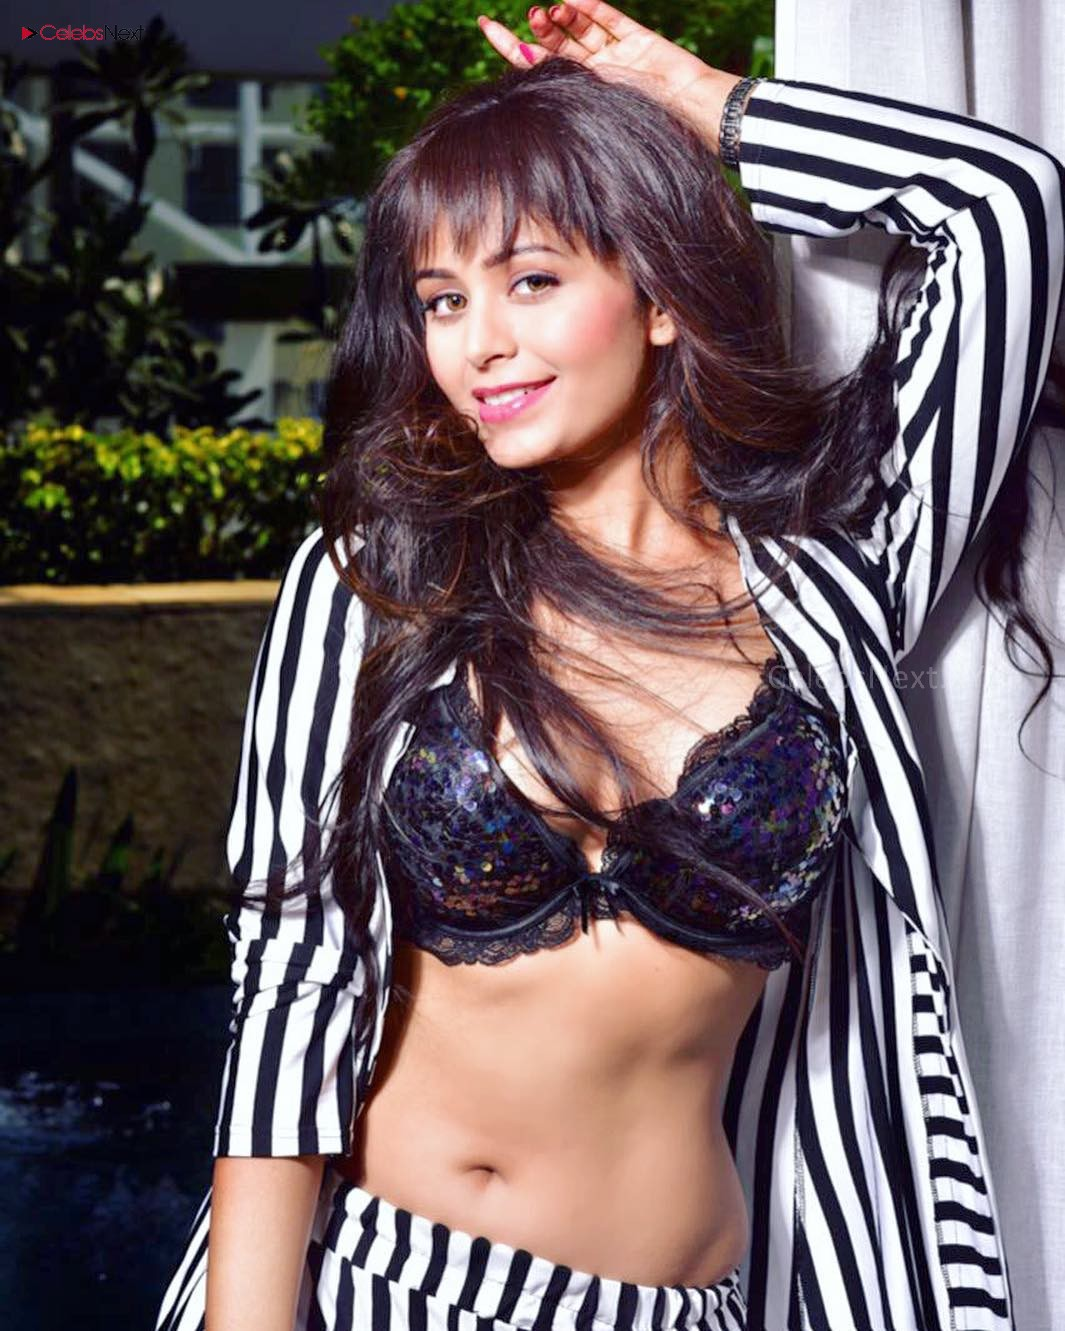 Bollywood beauties Models Actress Top Star Exlcuisve Summer Pics 2018